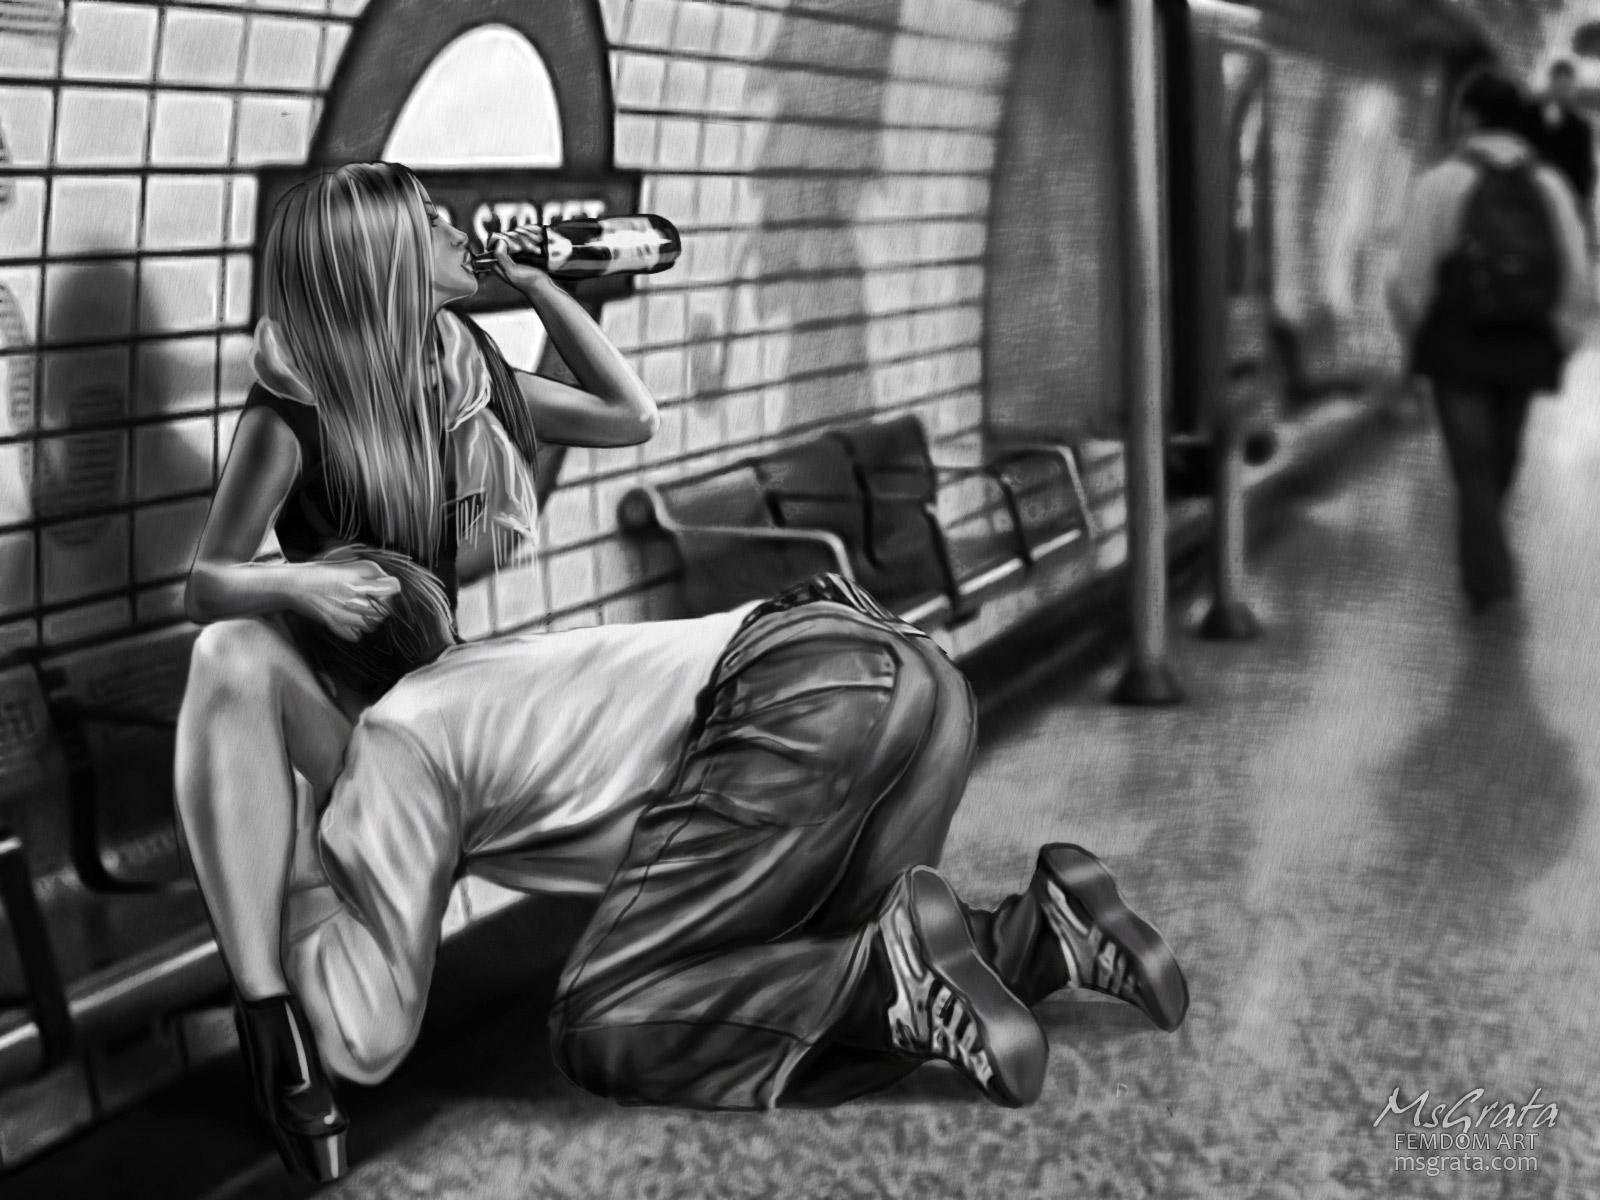 Underground public humiliation pussy eating facesitting femdom art drawing